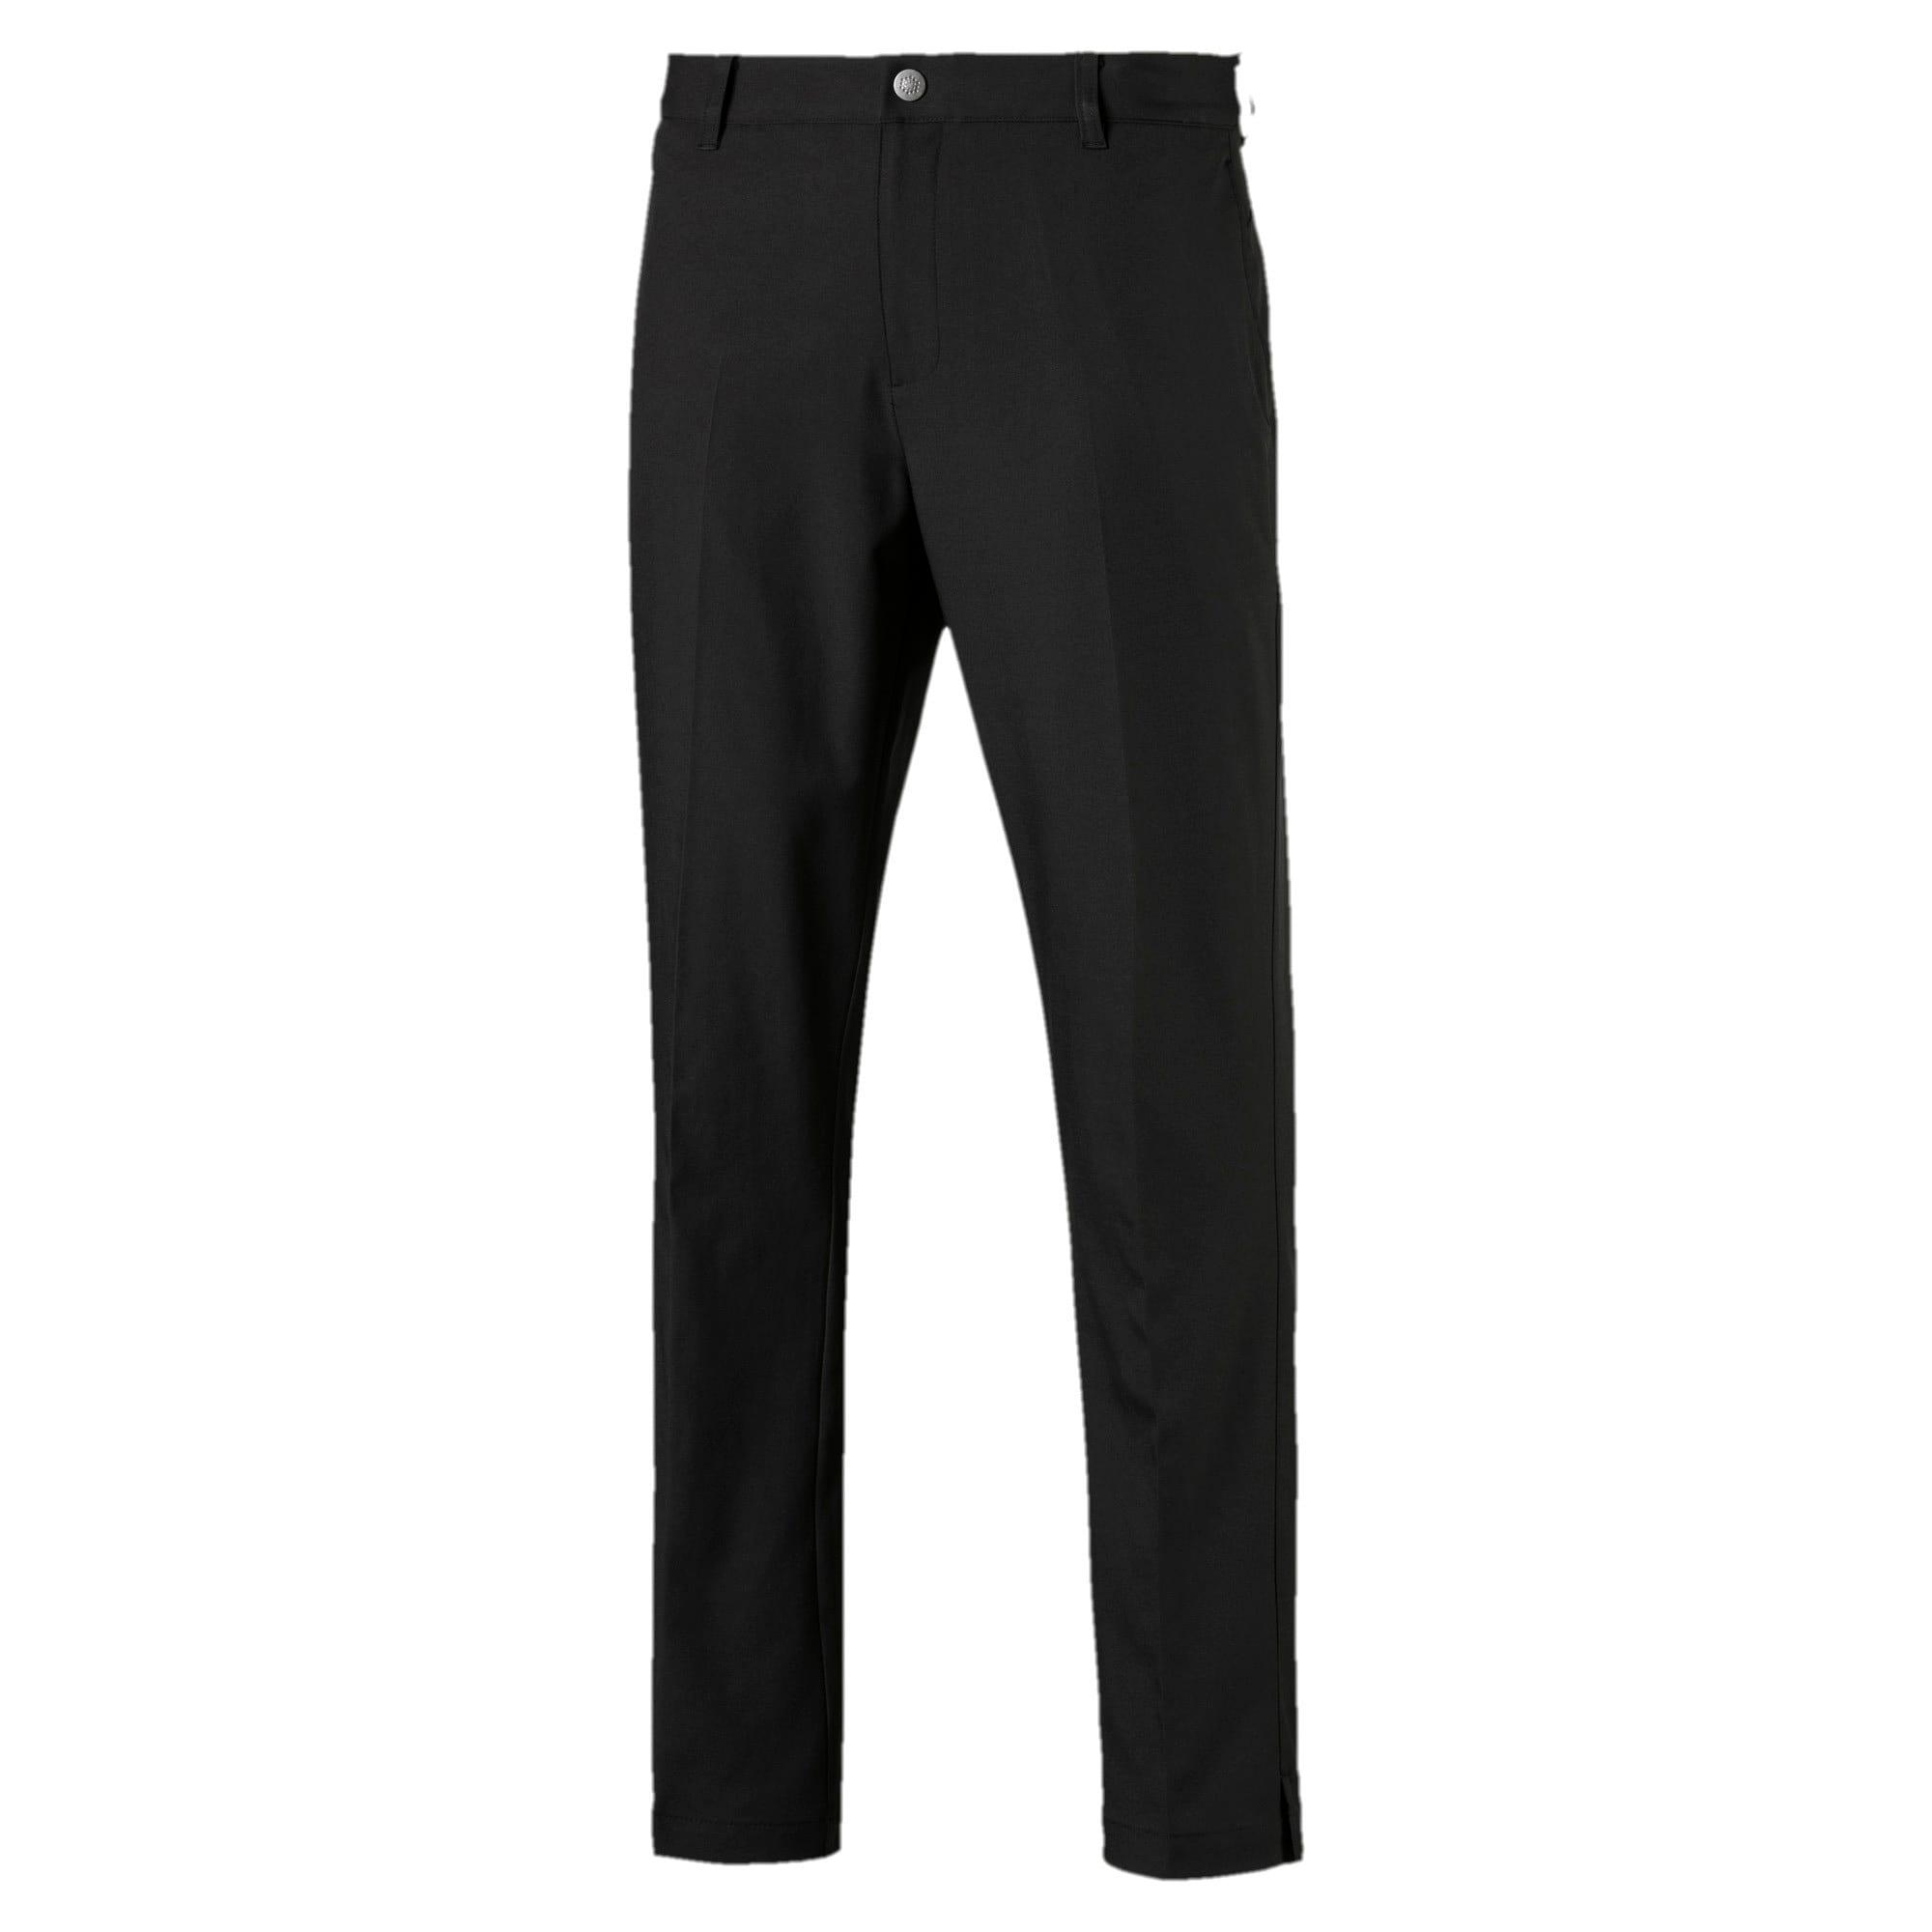 Thumbnail 1 of Jackpot Men's Pants, Puma Black, medium